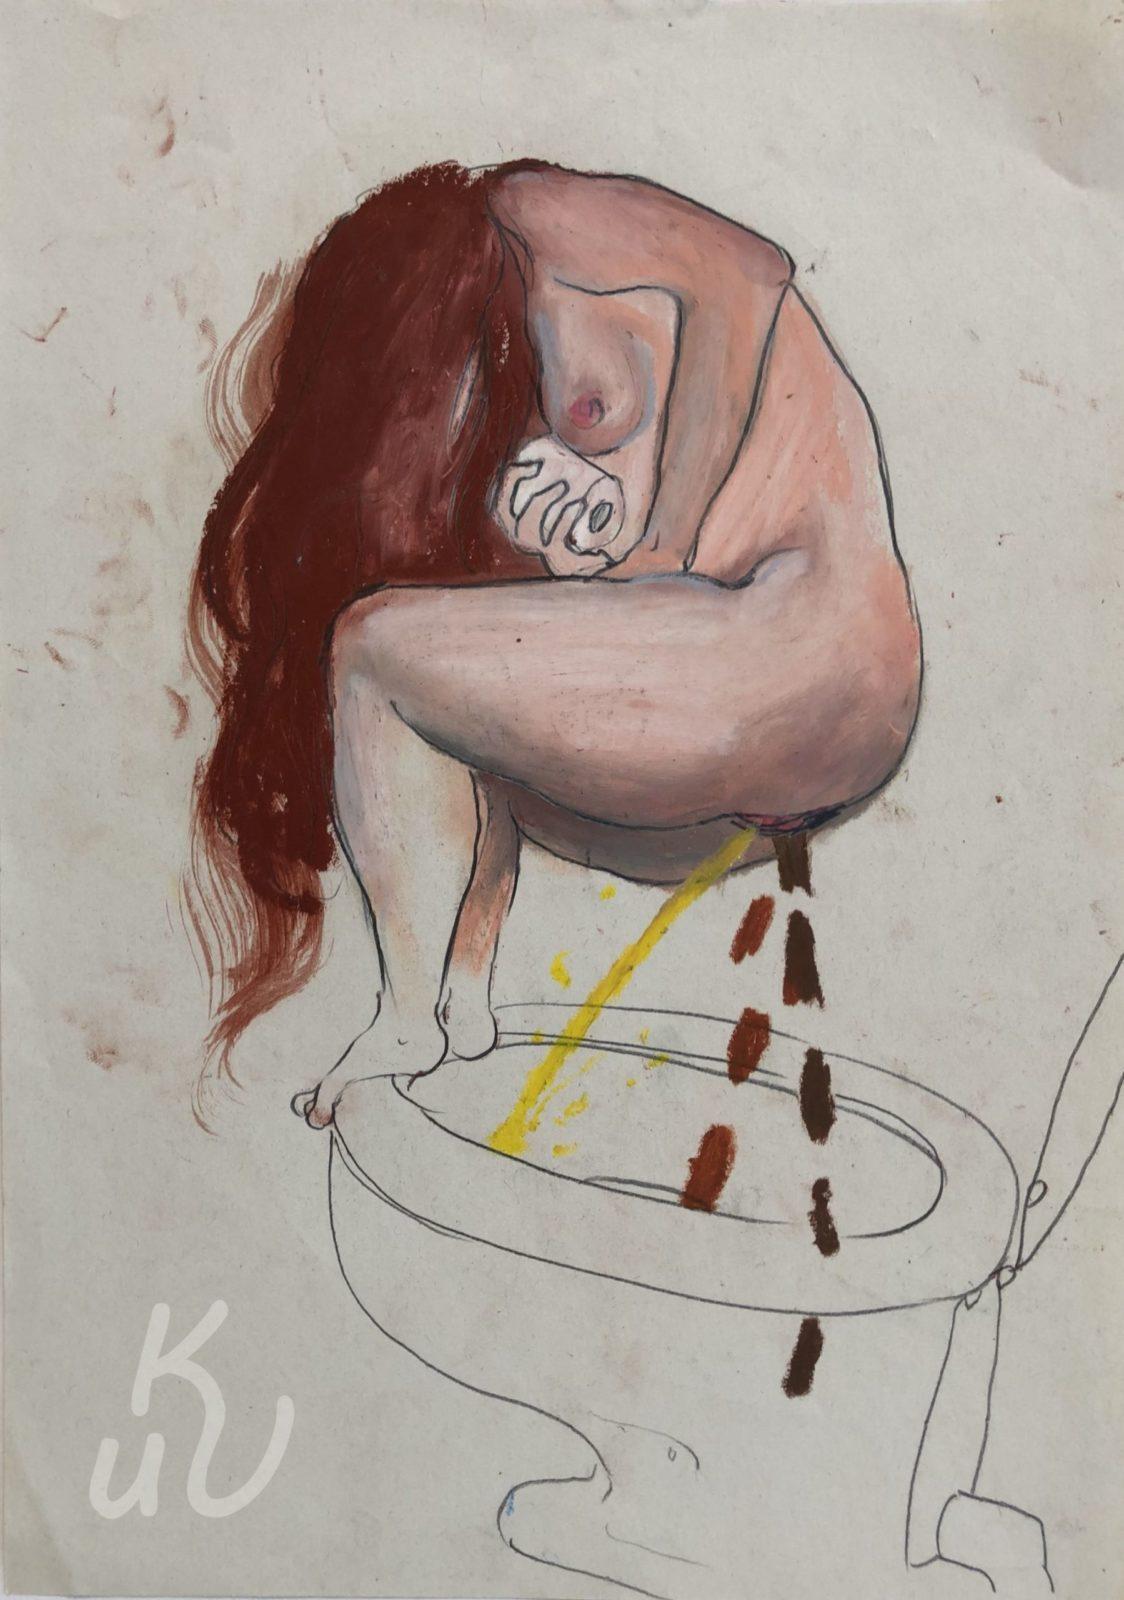 Pooping Jugendstil von Jonas Mosbacher